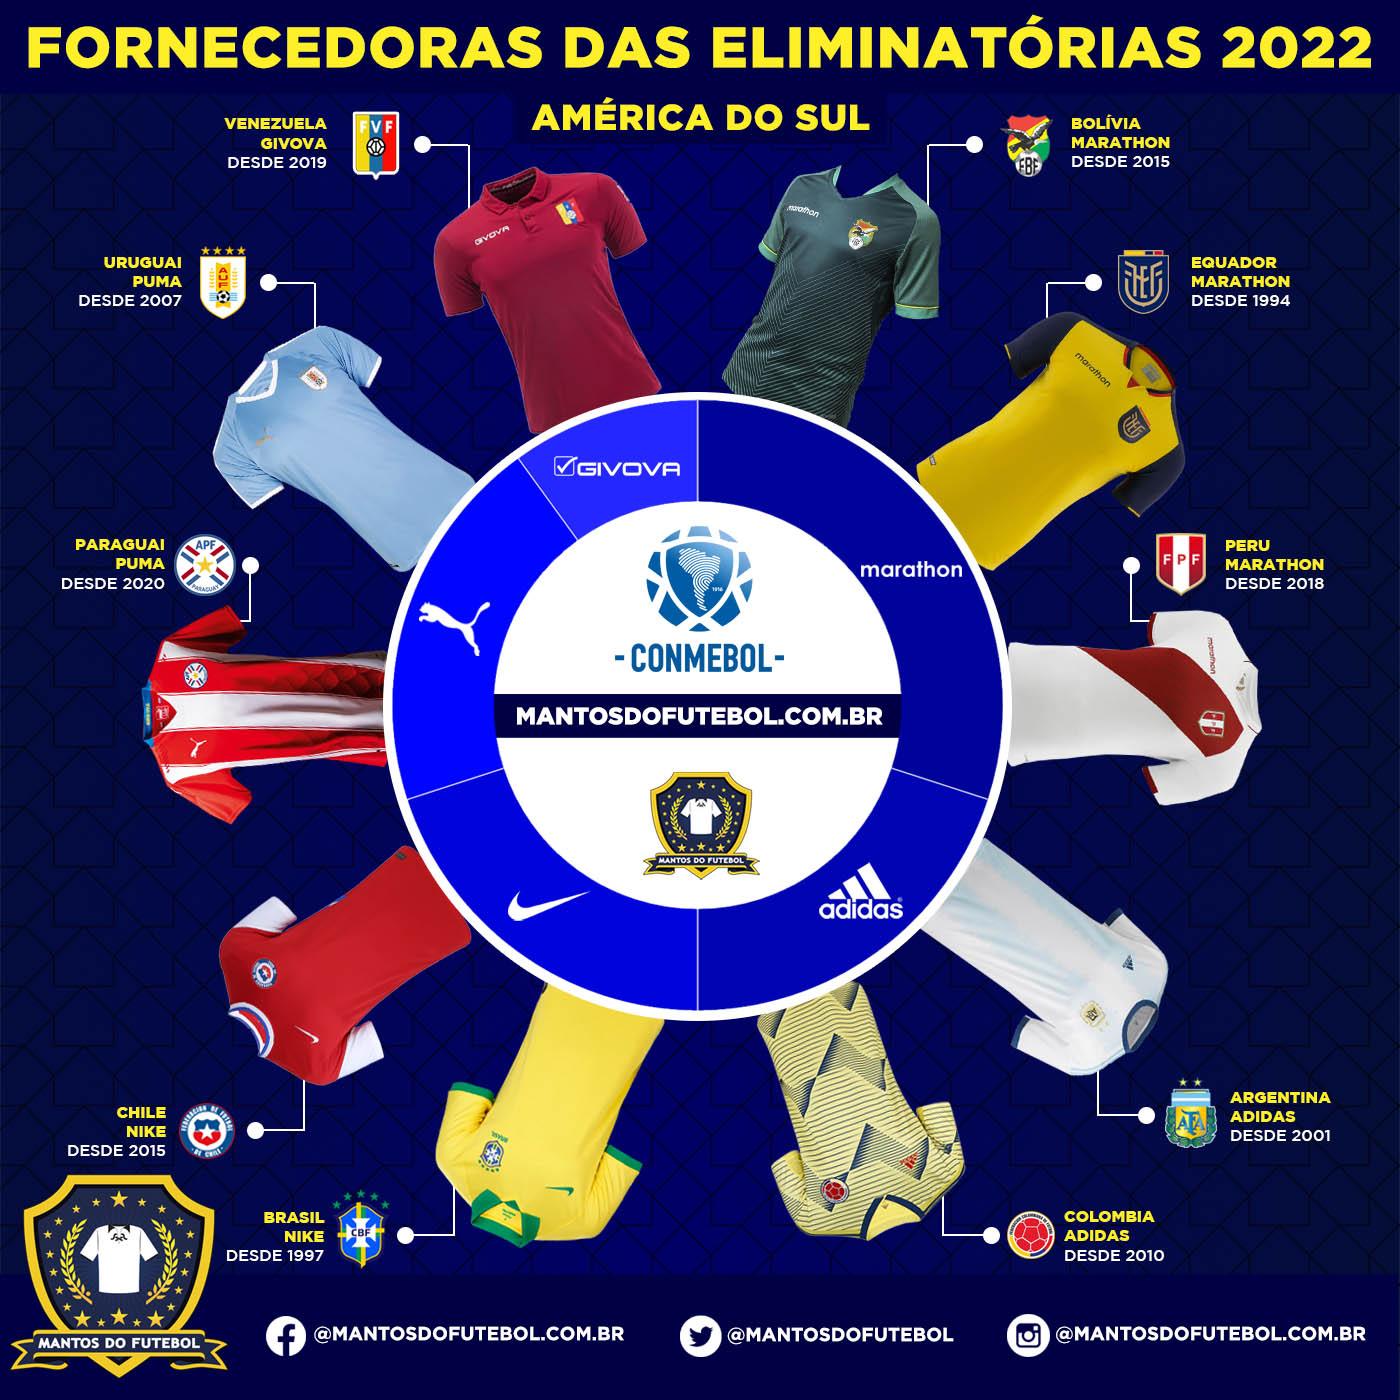 Infografico Eliminatorias Sul-Americanas 2020-2021